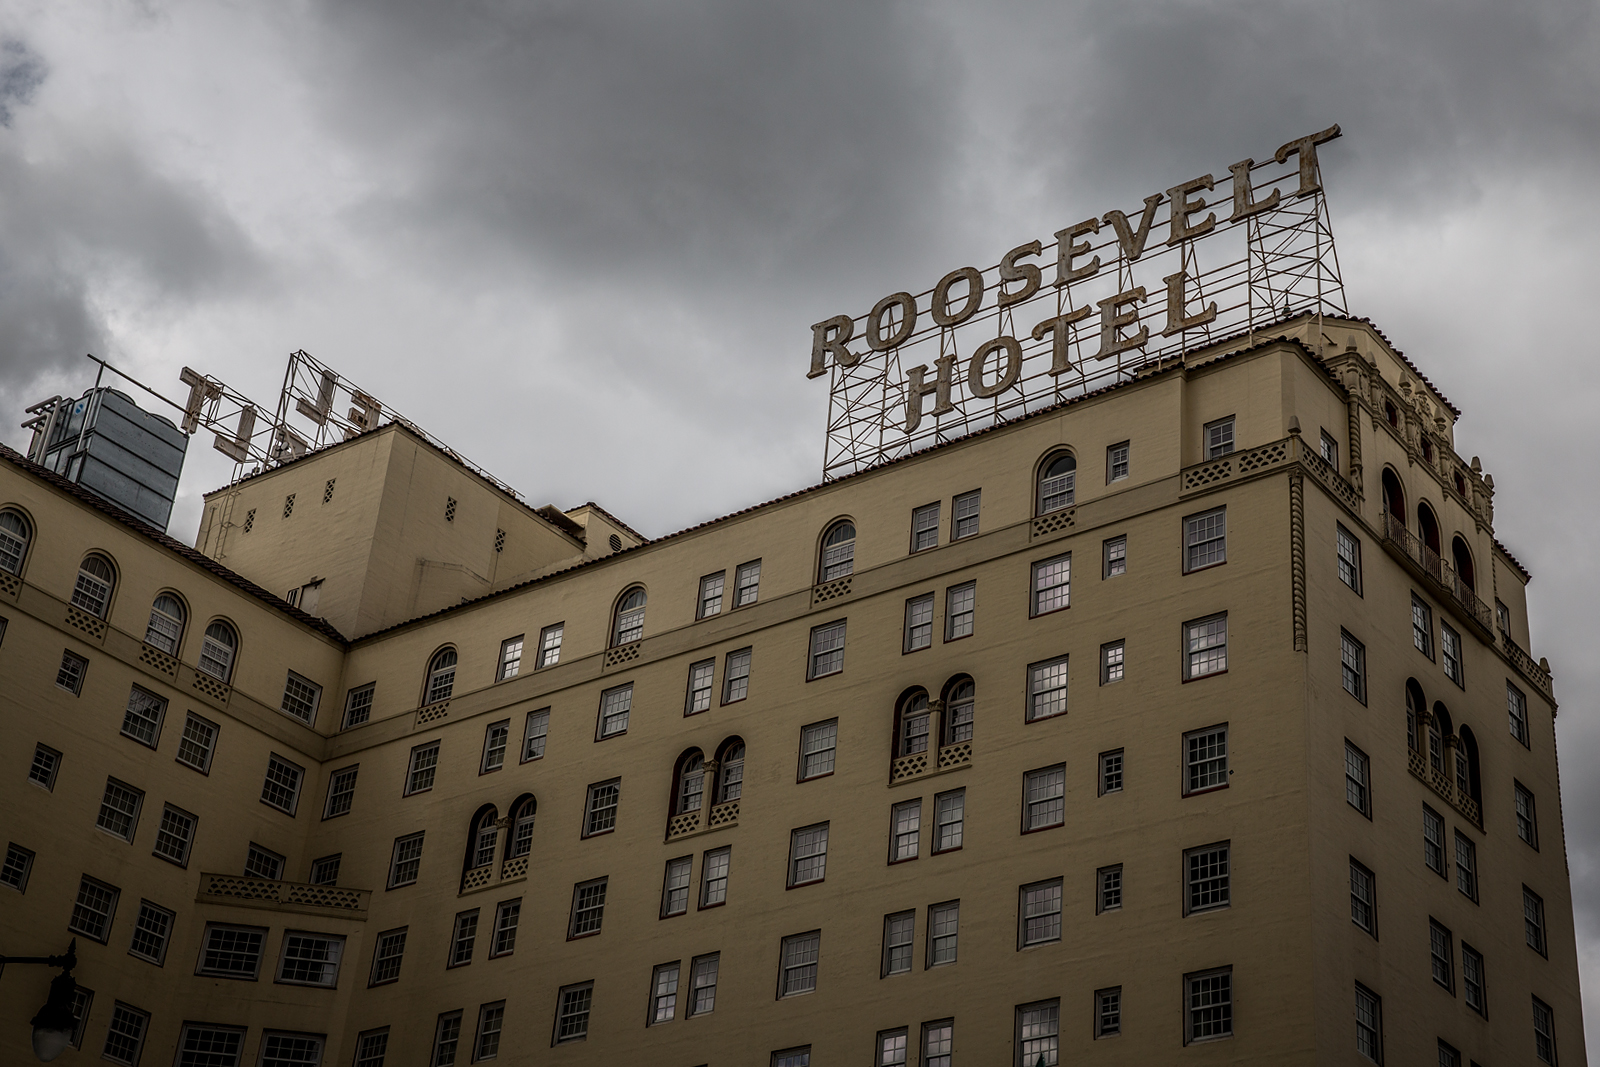 bolfo_0008s_0007_Rosevelt Hotel